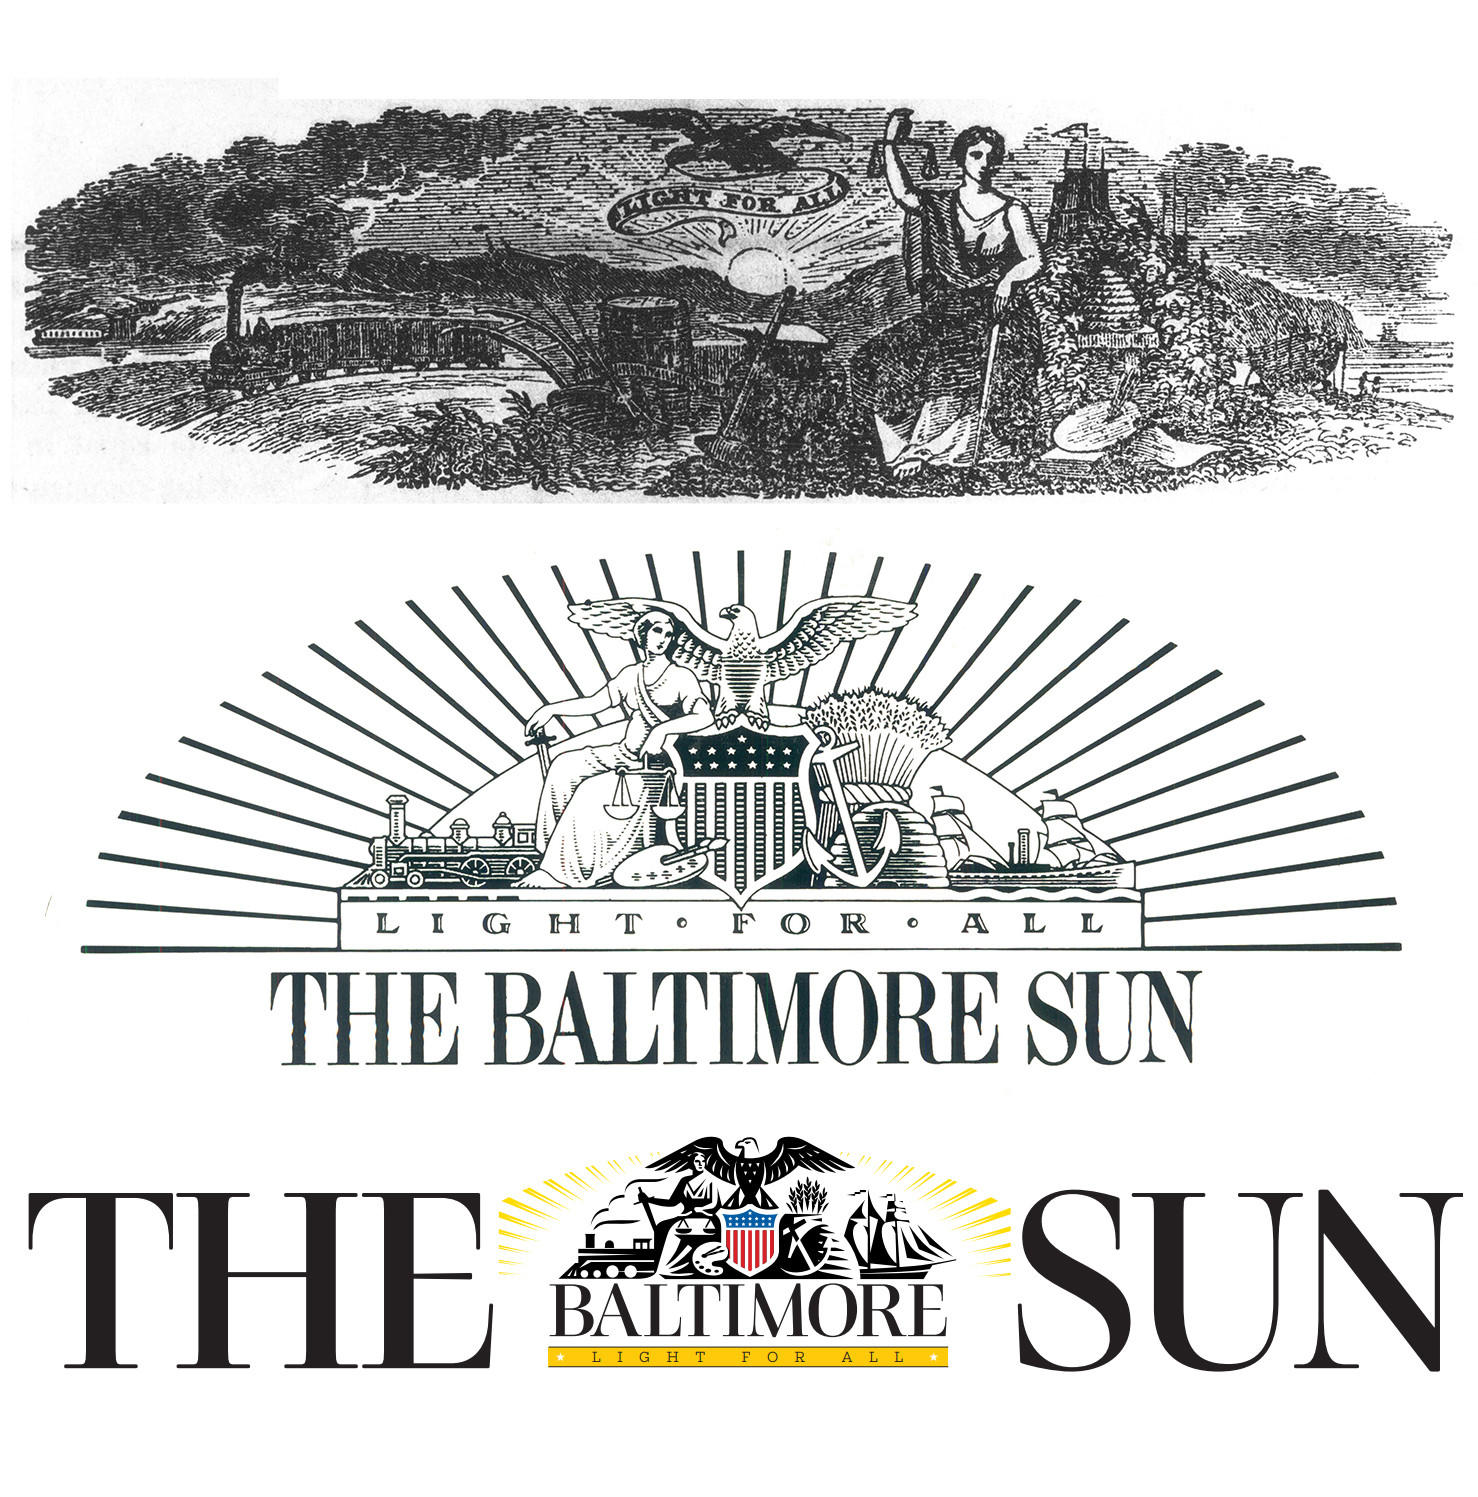 baltimore sun vignette through the years